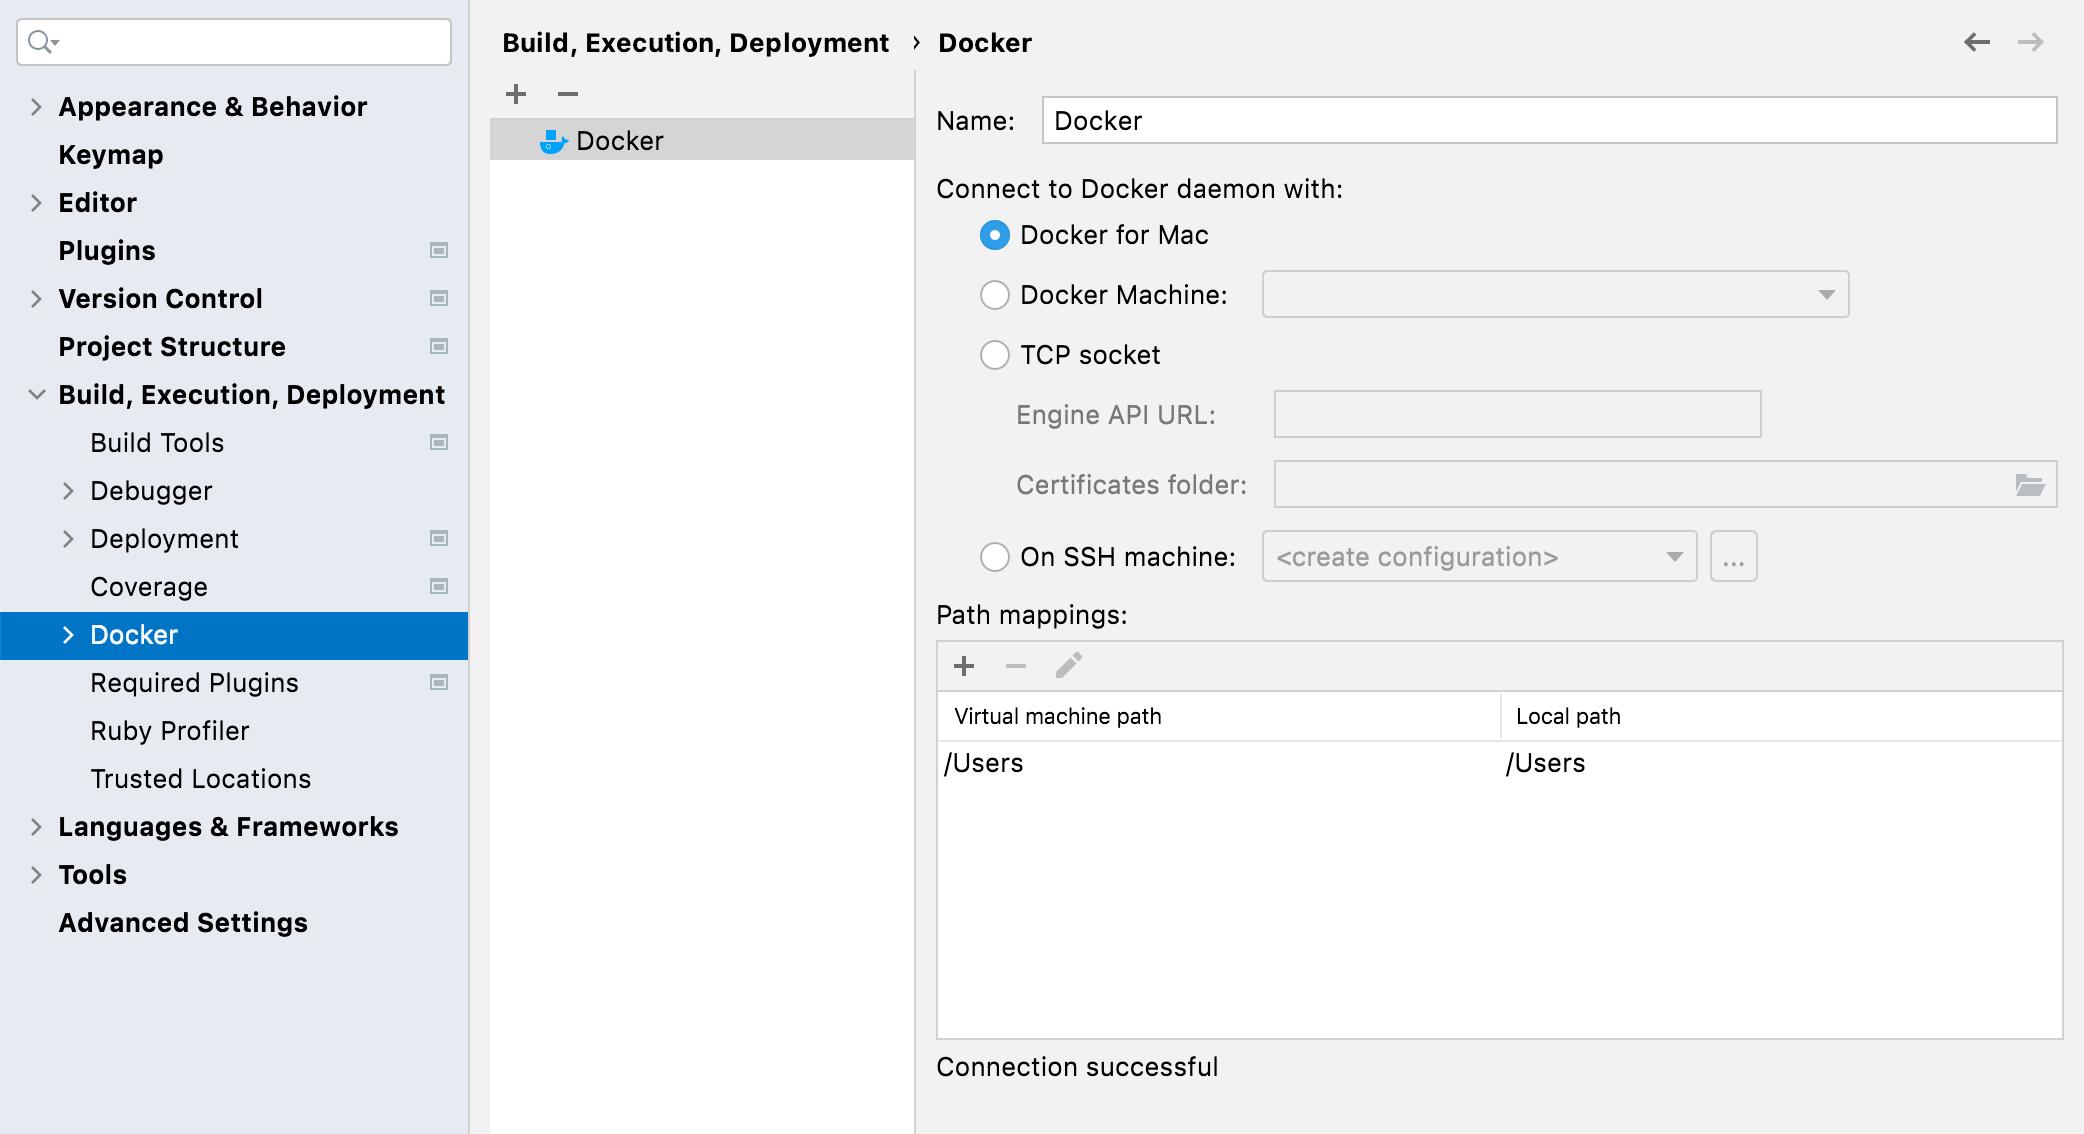 Docker connection settings